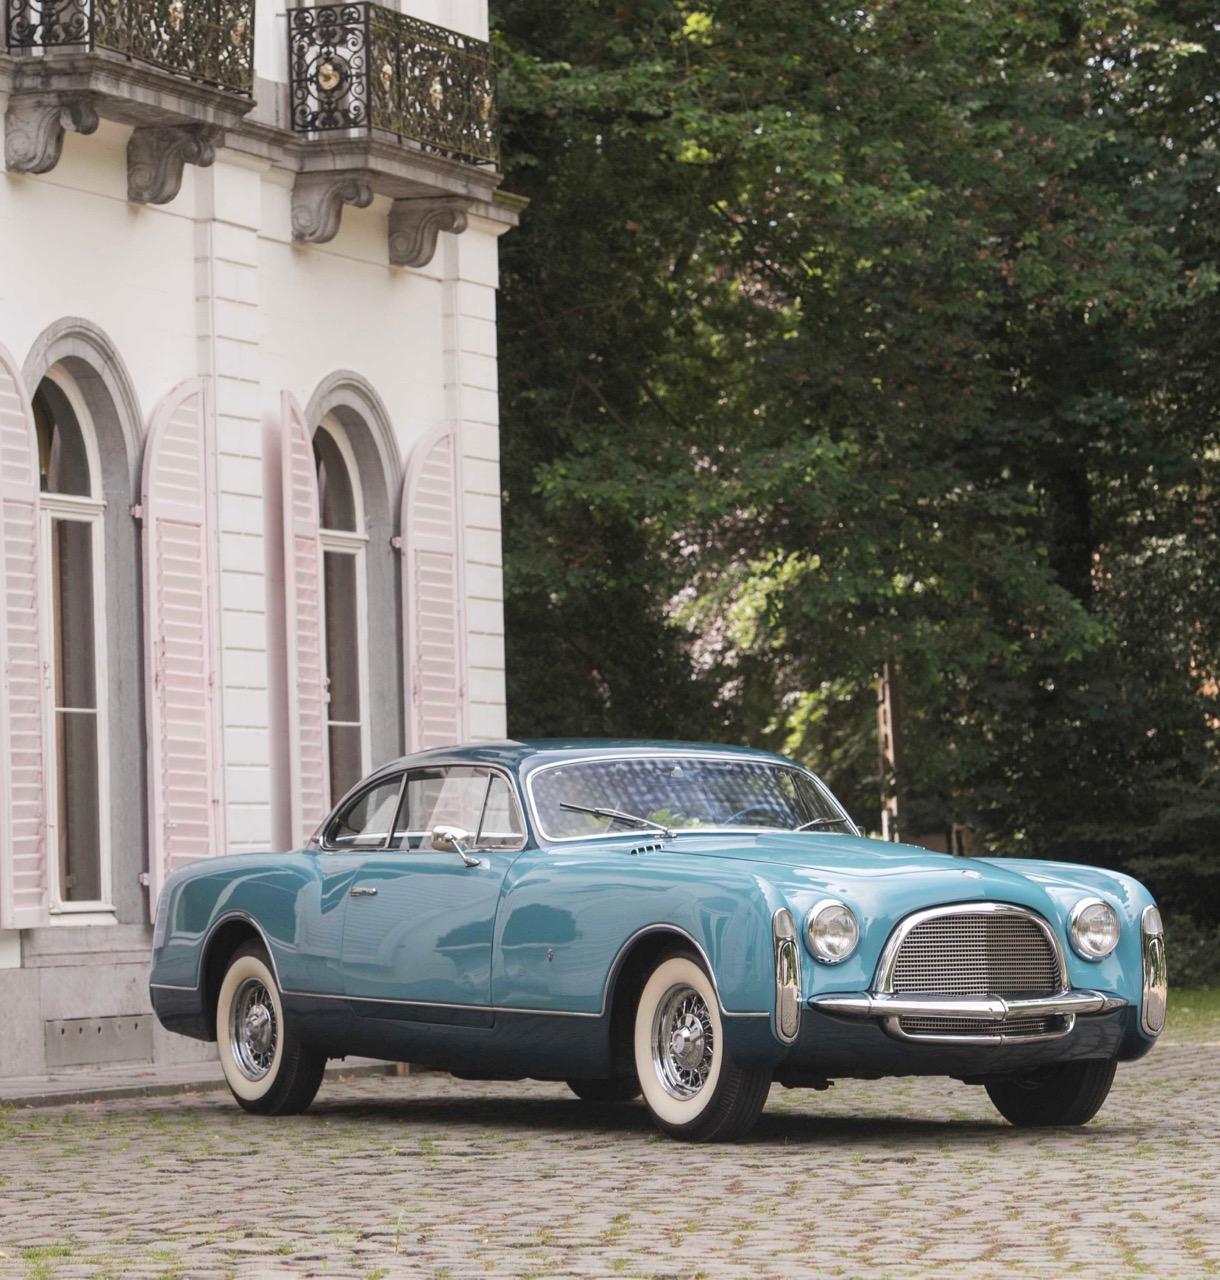 - ClassicCars.com Journal